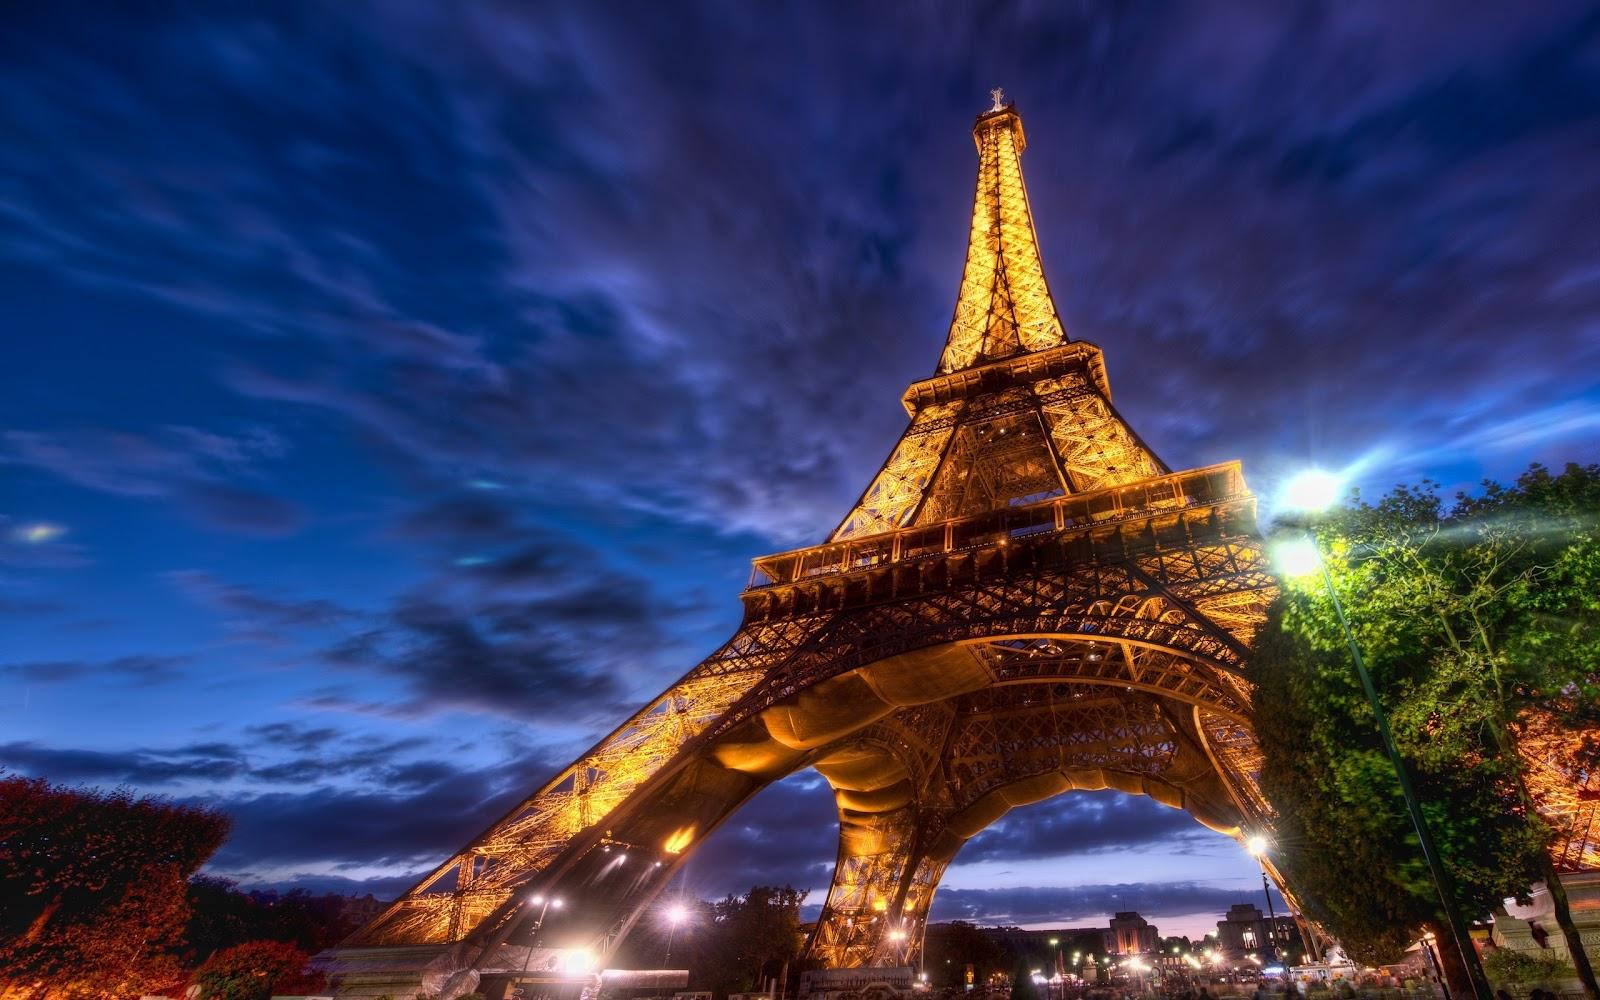 http://4.bp.blogspot.com/-kKXdvA4eZJw/UXg1-Cx0ZkI/AAAAAAAAcEk/uUjN0N5dlr4/s1600/Eiffel-Tower-Paris-Wallpaper-2560x1600.jpg